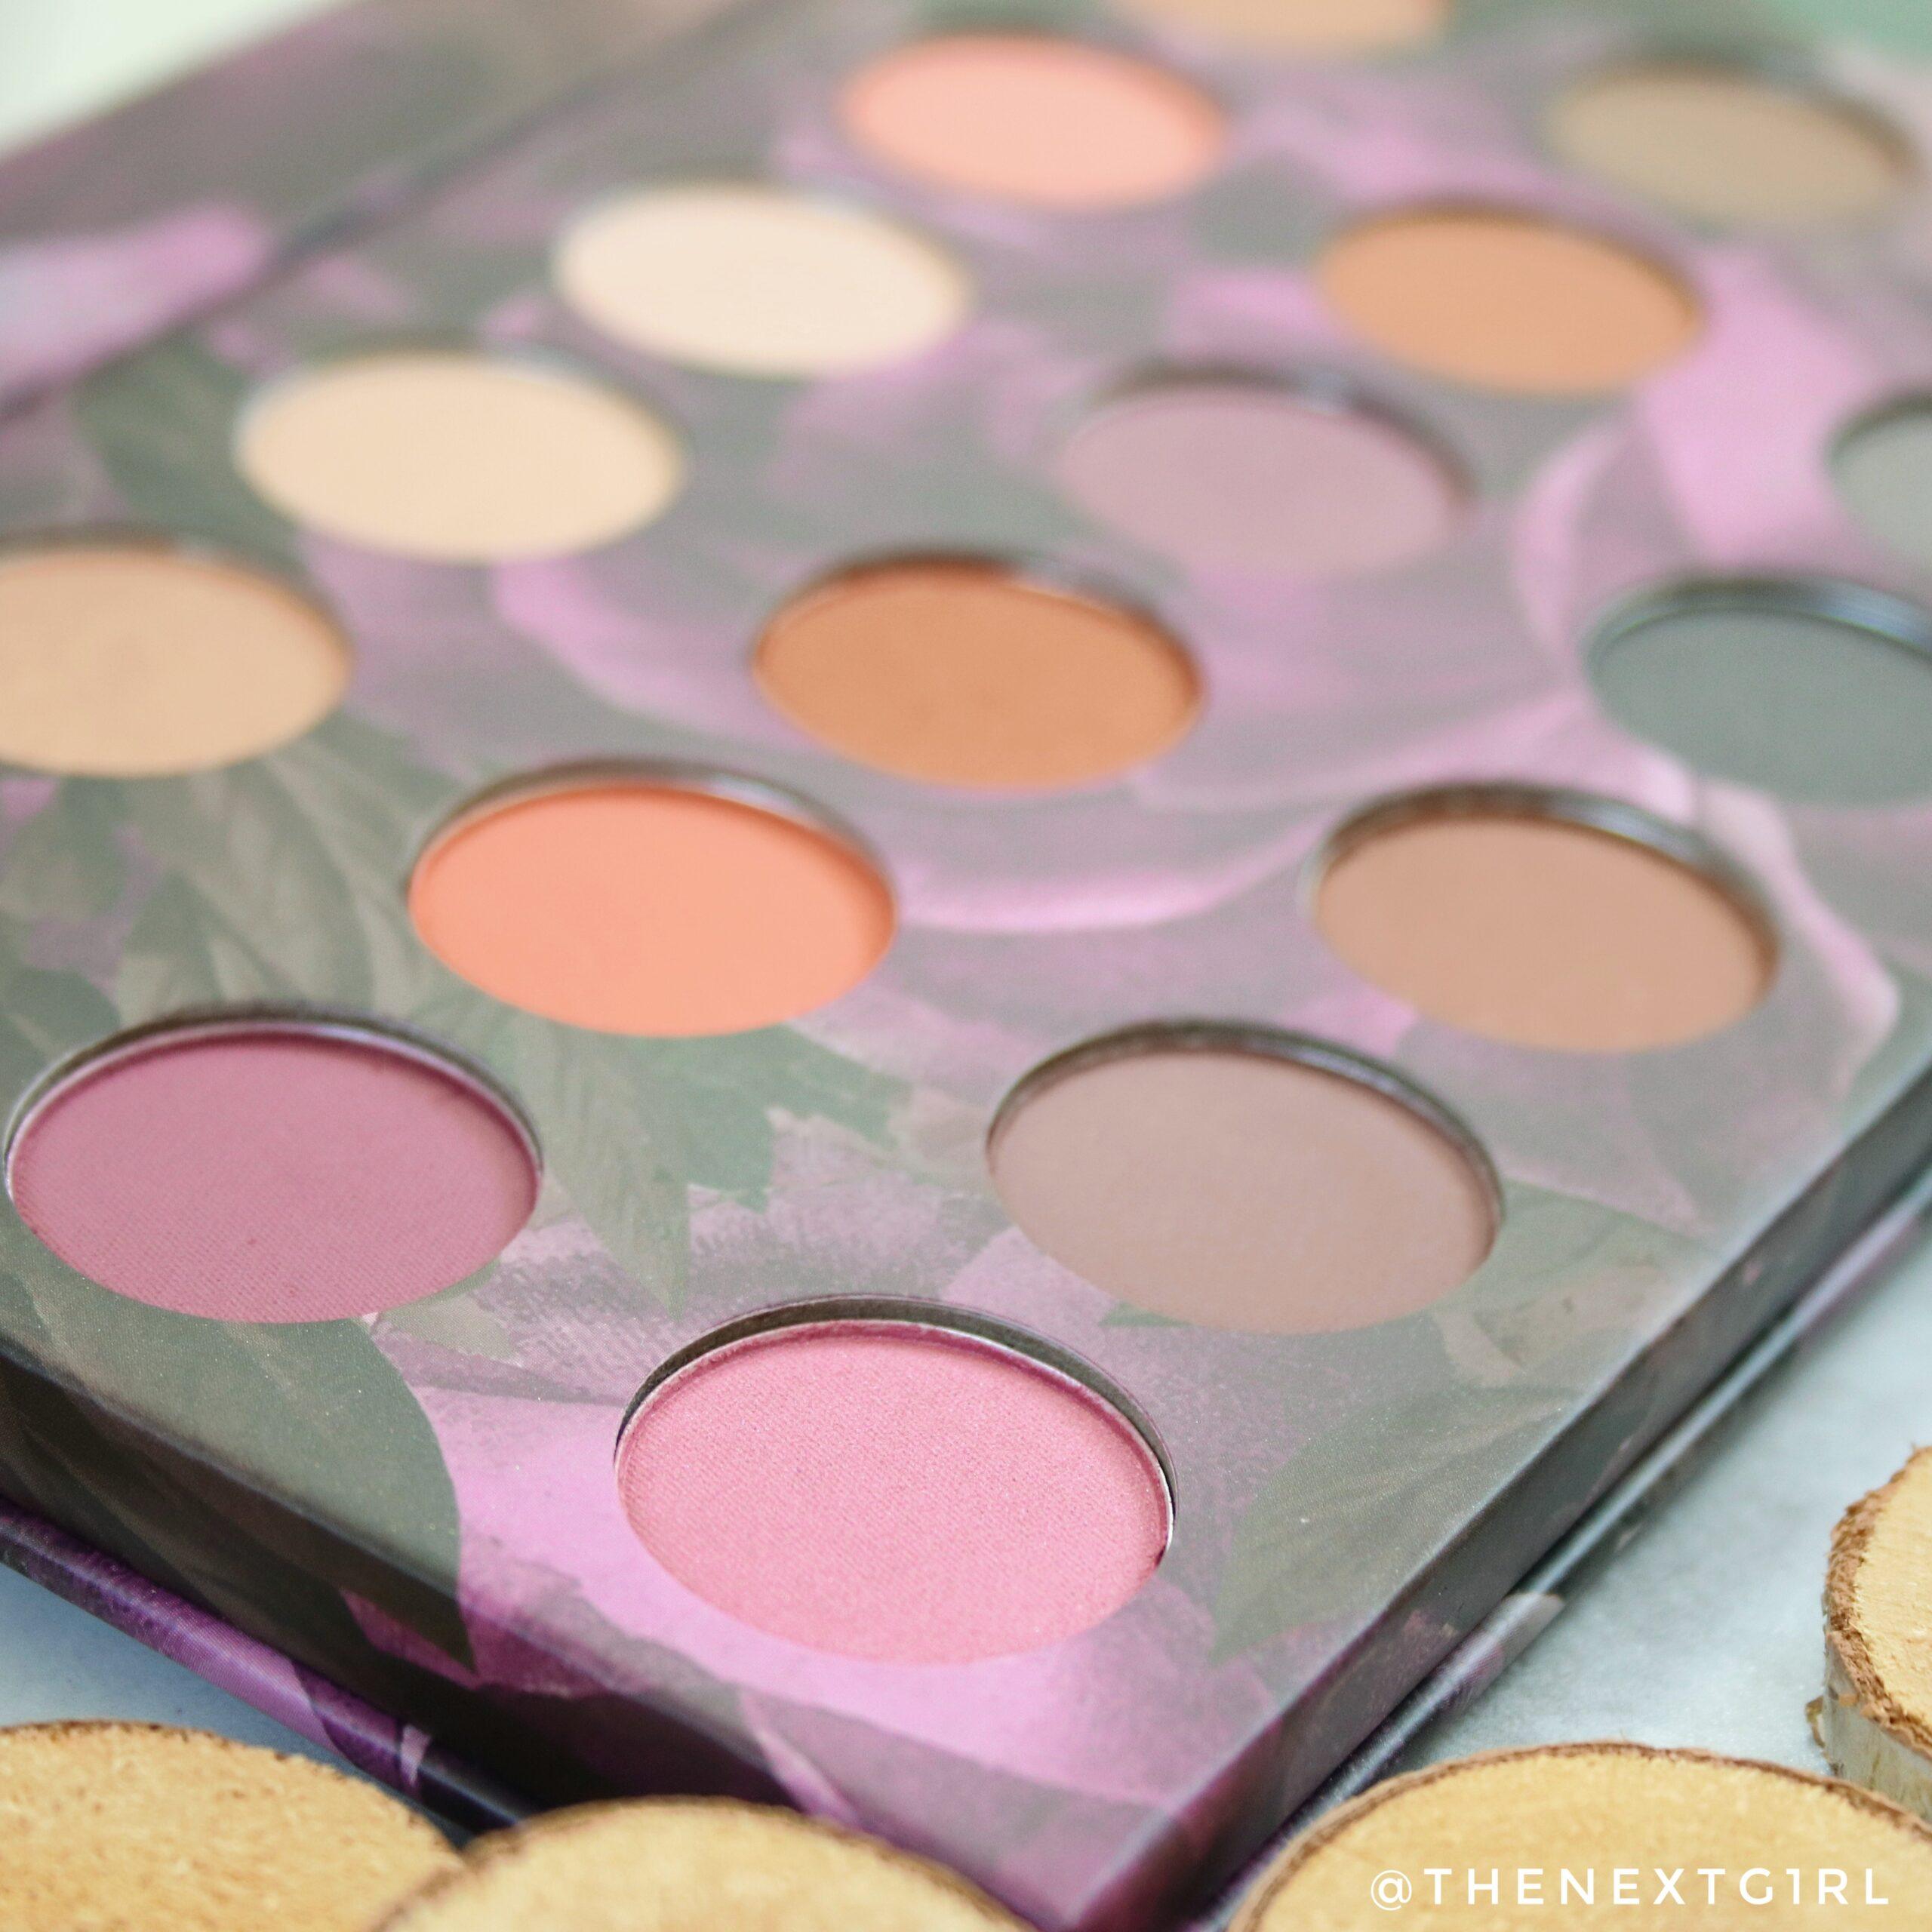 Kleuren in Max & More oogschaduwpalette Bloom Close-up 1